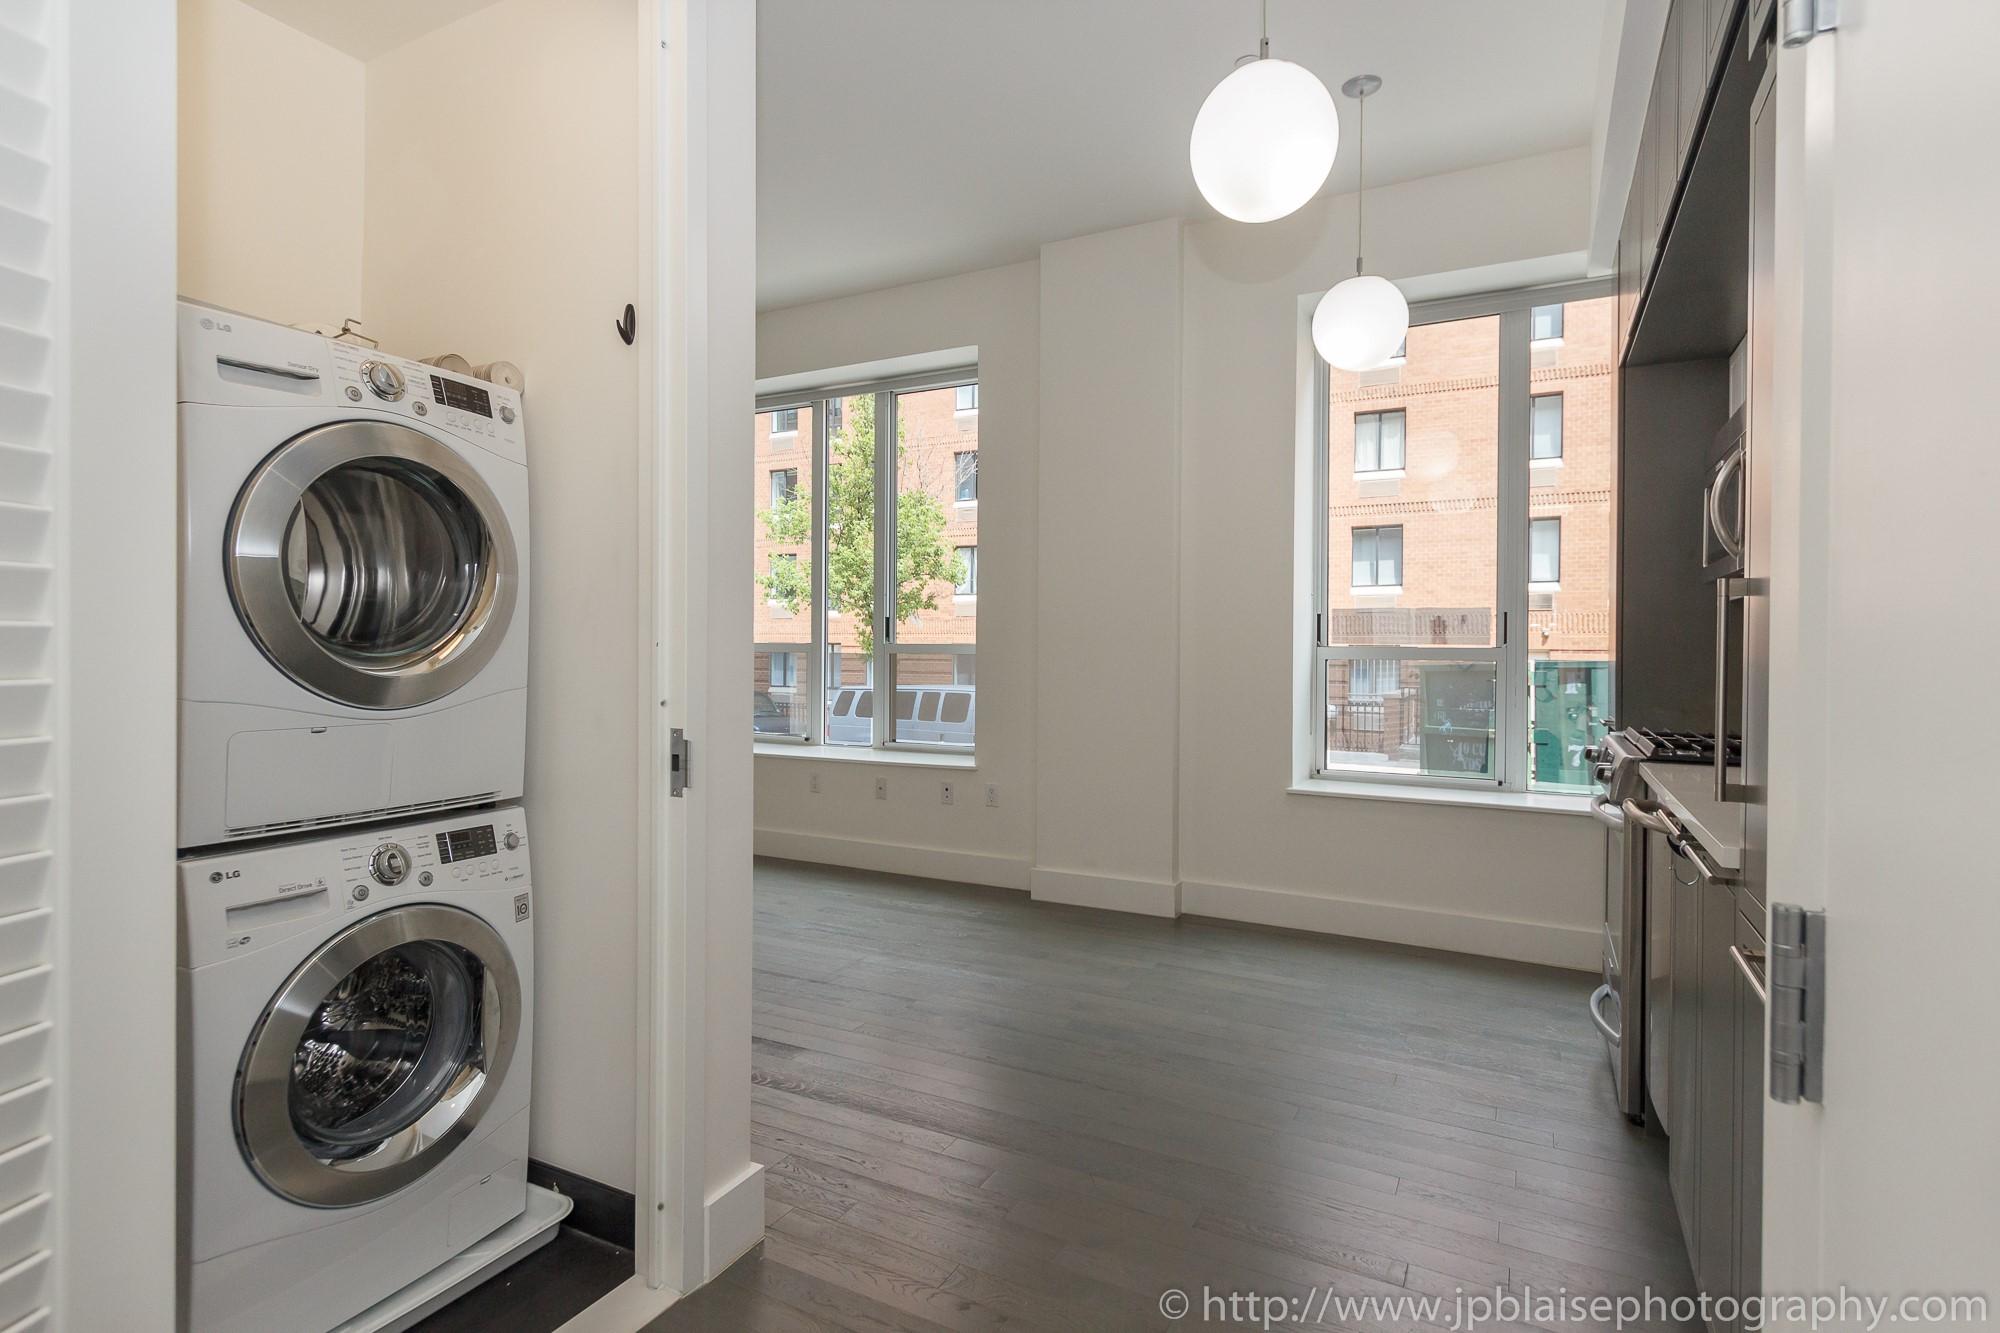 Real Estate Apartment Photographer Midtown West 1 Bedroom Unit Entrance Jp Blaise Photography